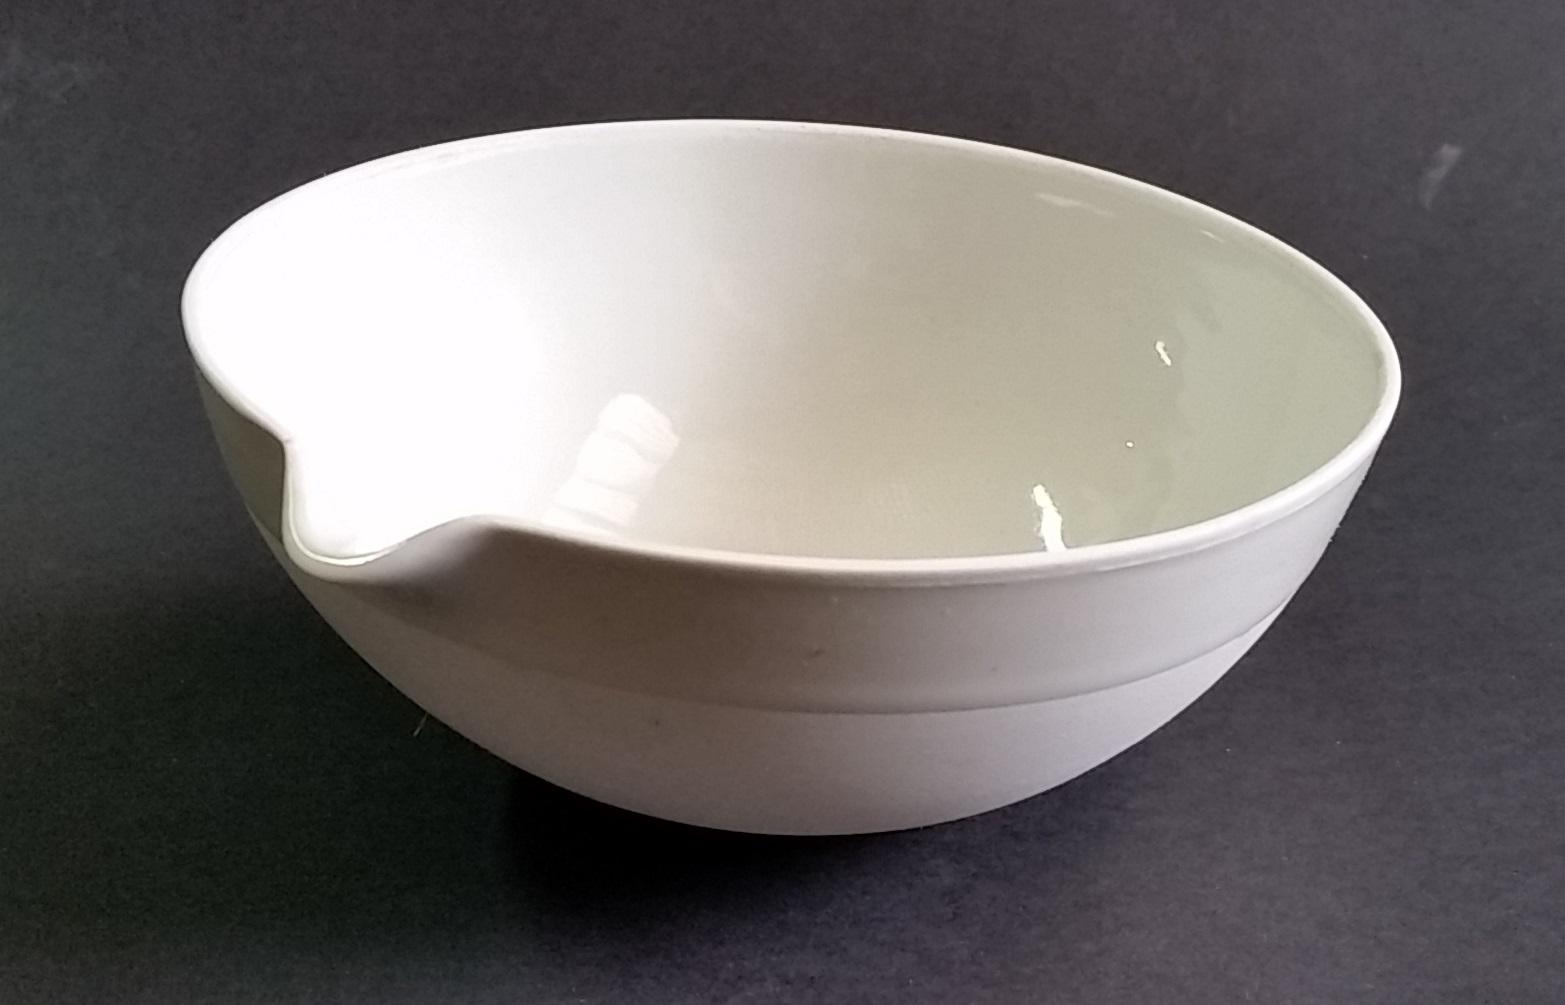 C psulas porcelana con fondo redondo hermanos lamo for Marcas de vajillas de porcelana